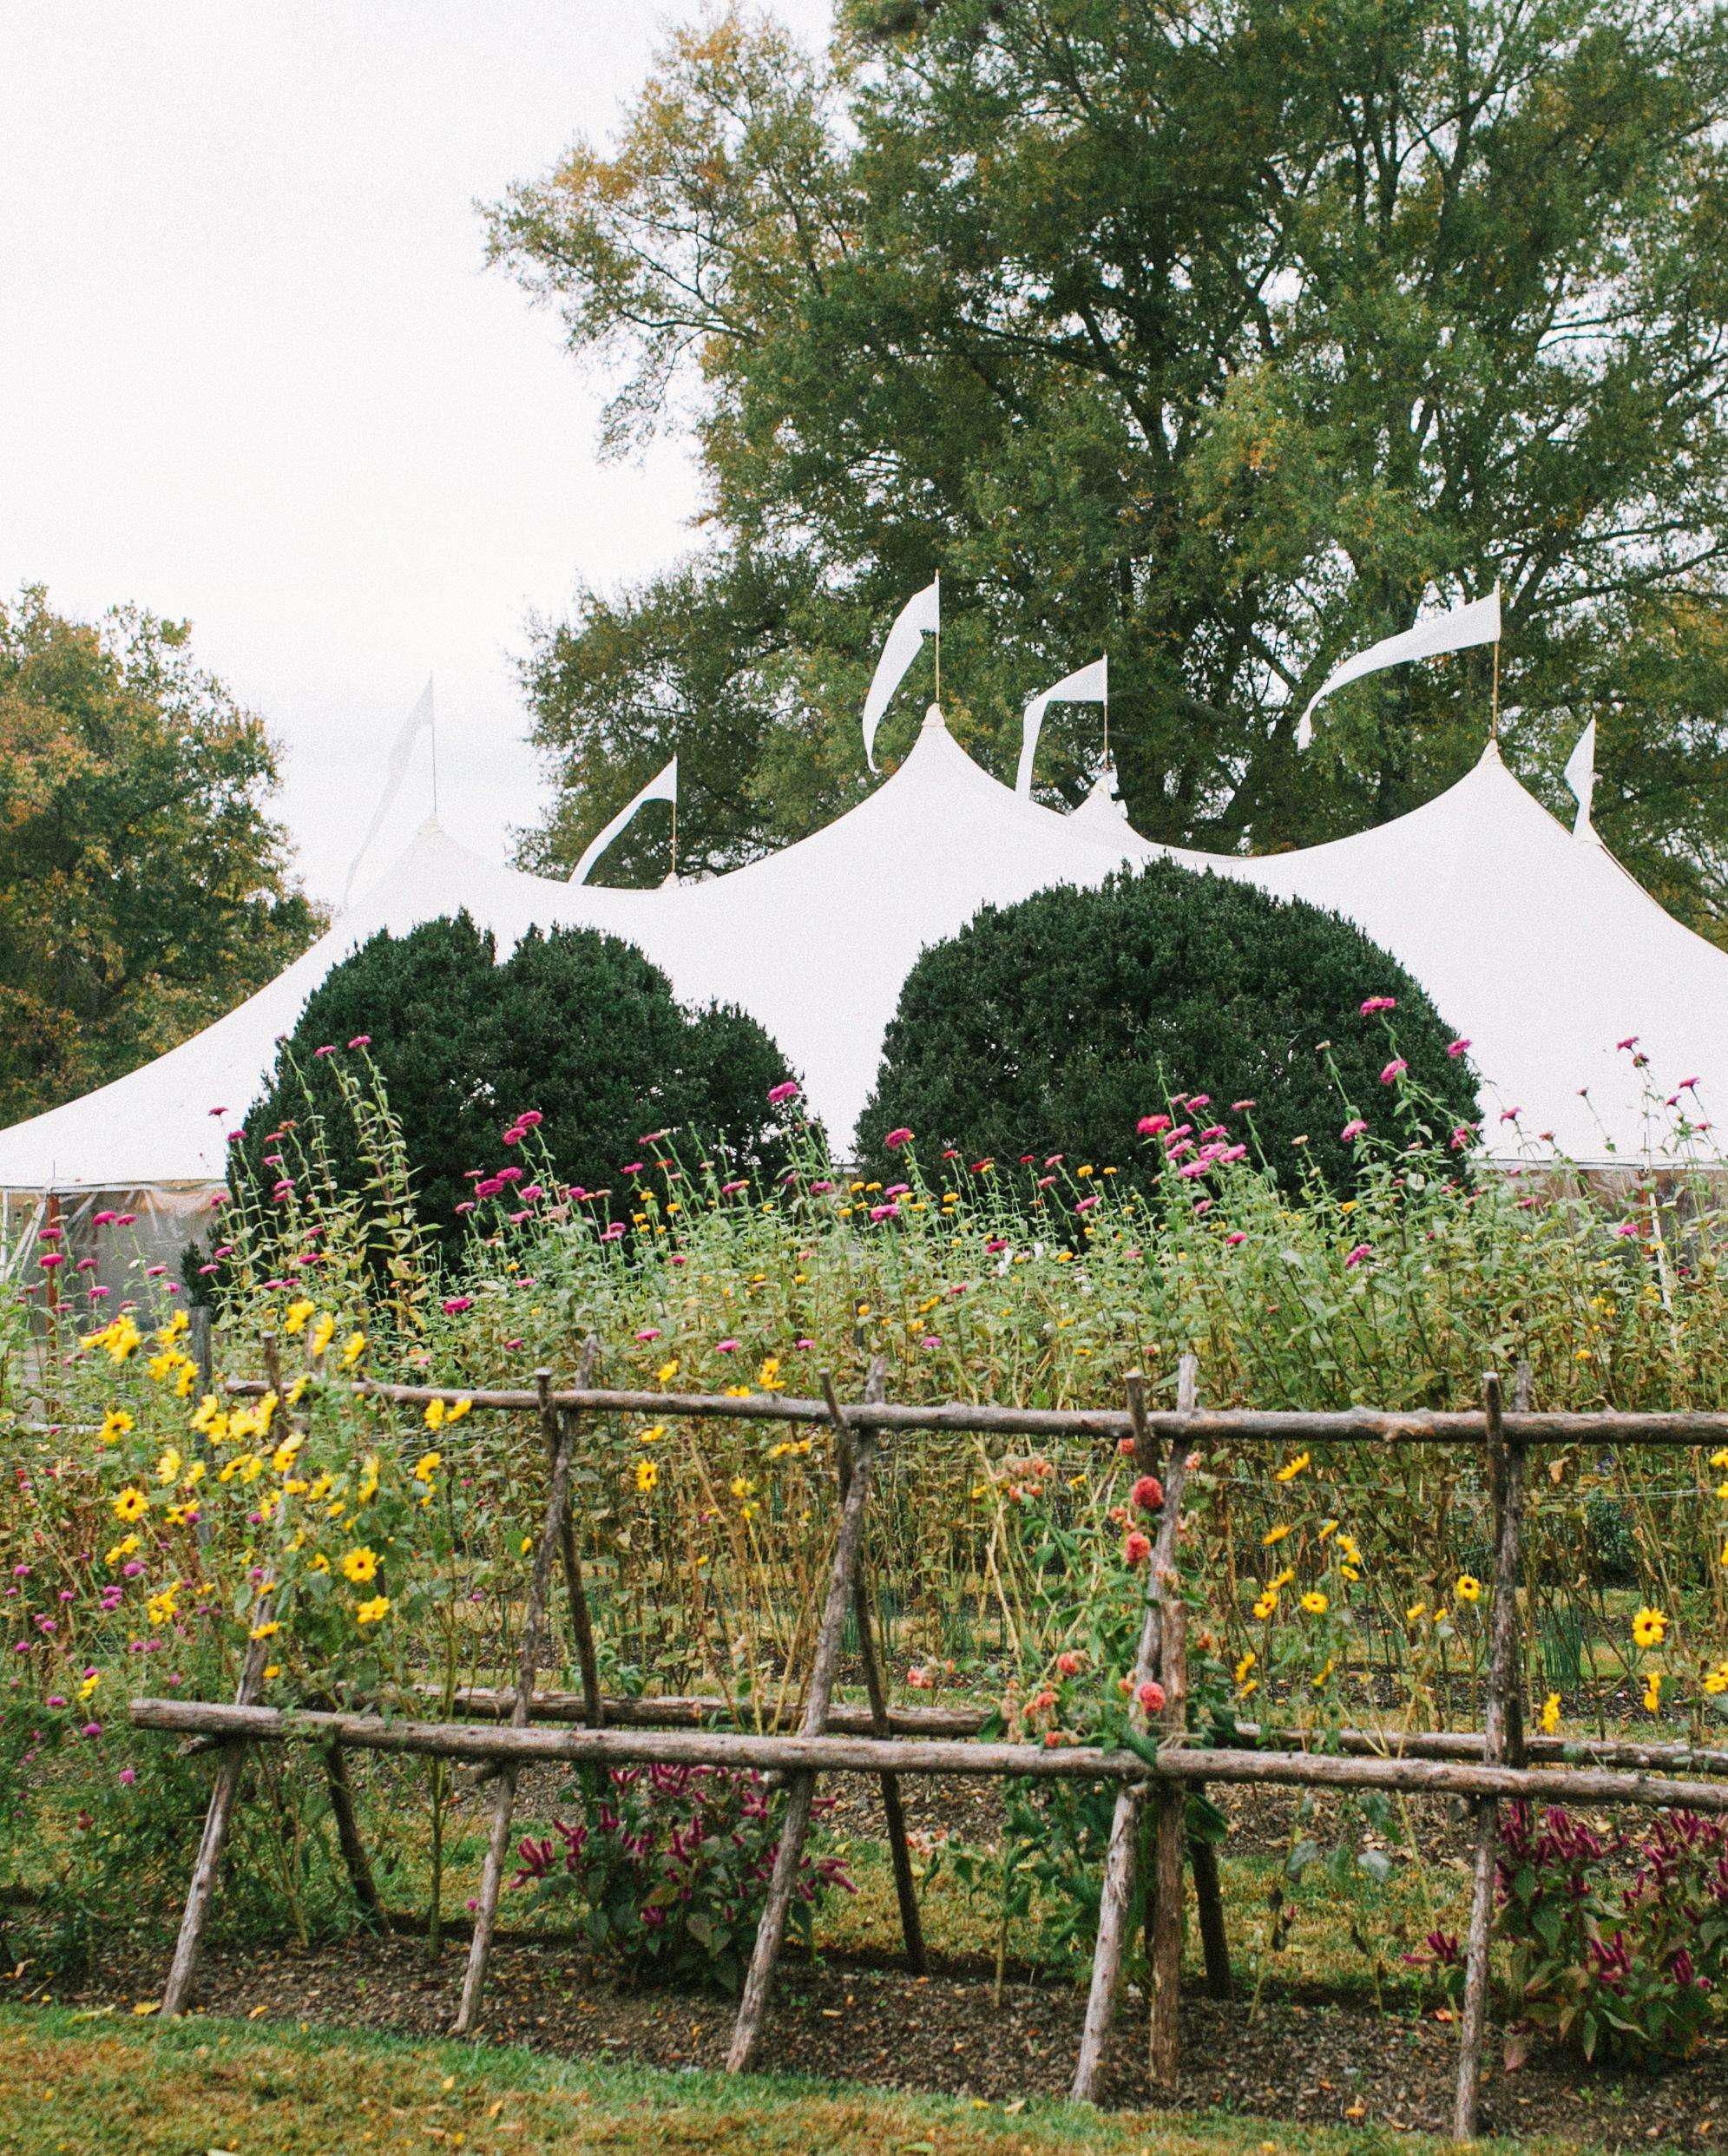 brittany-andrew-wedding-tent-071-s112067-0715.jpg